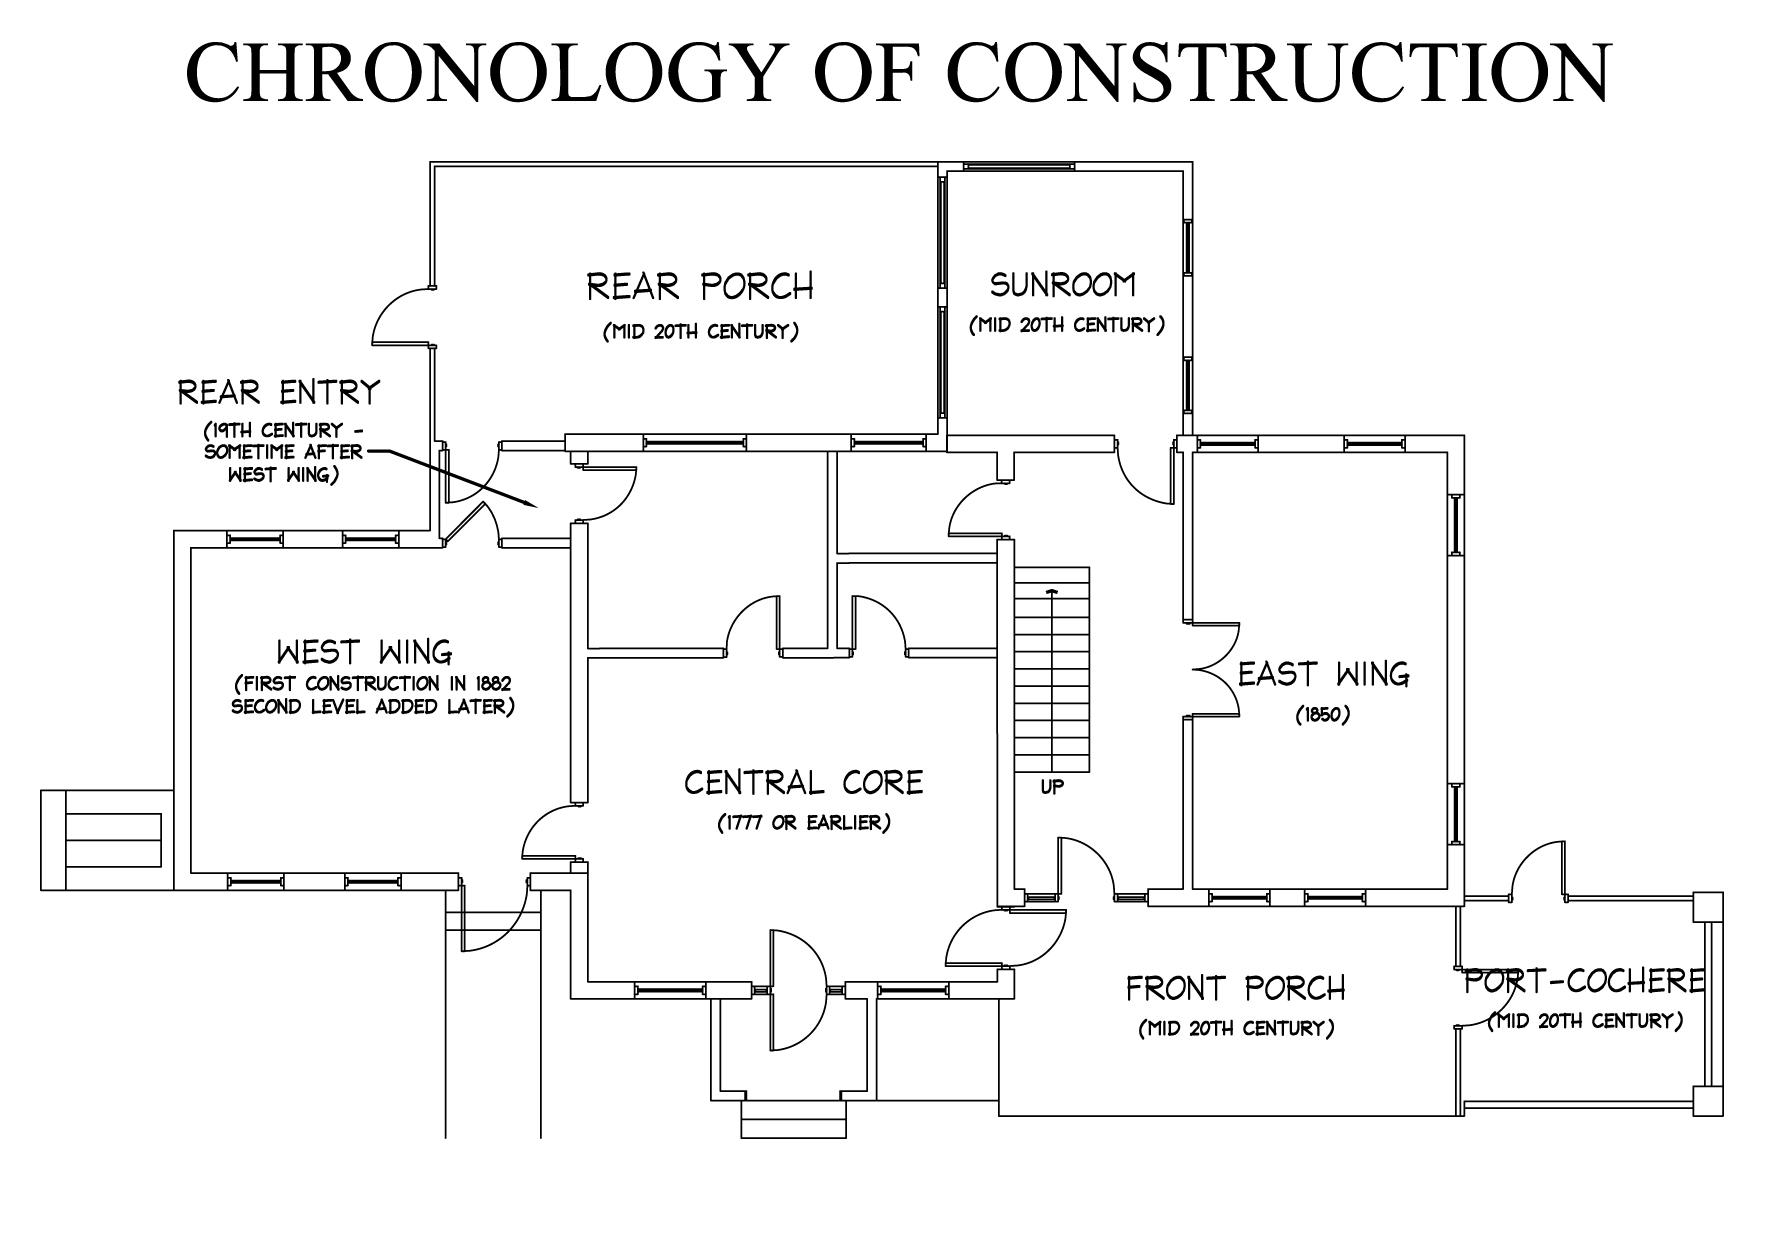 Diagram illustrating the chronology of developmental use